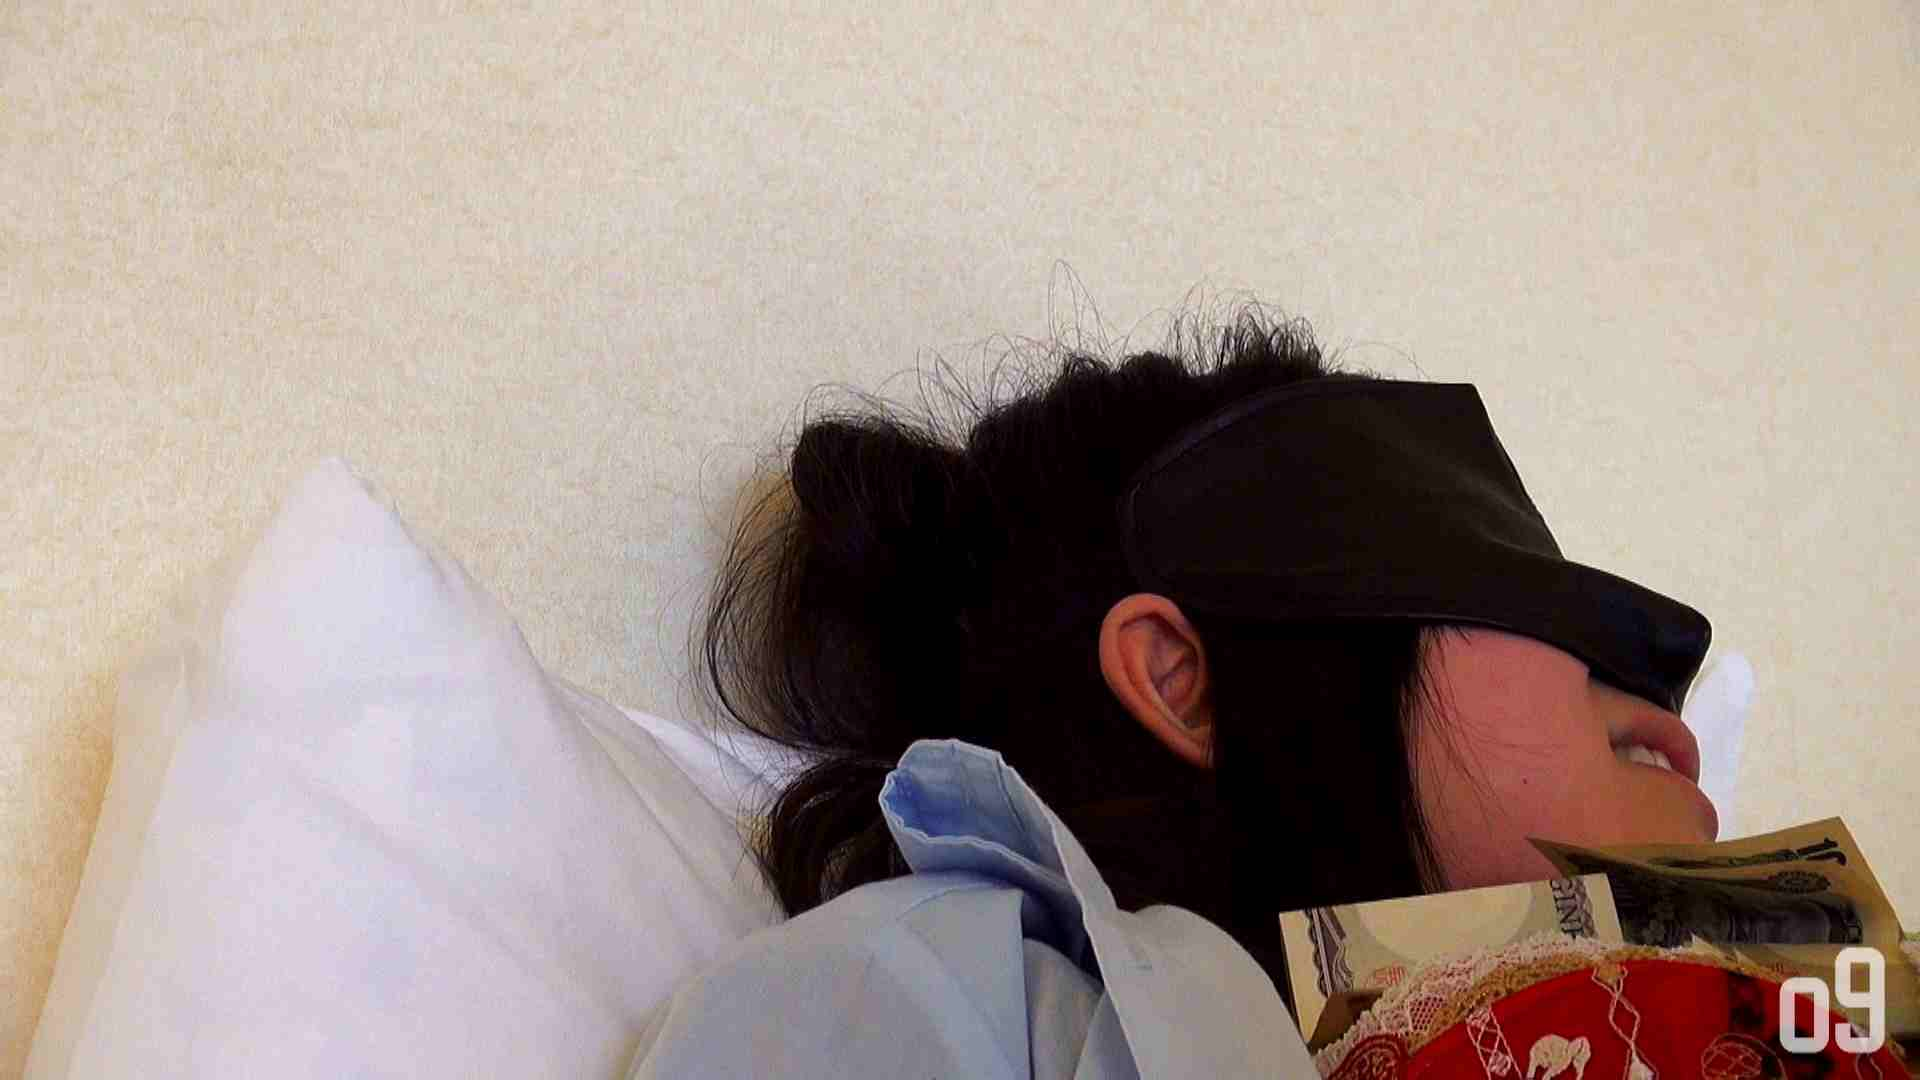 vol.6 TKSさんが震える!留華ちゃんの不慣れな手コキで念願の射精! OLハメ撮り  94Pix 38